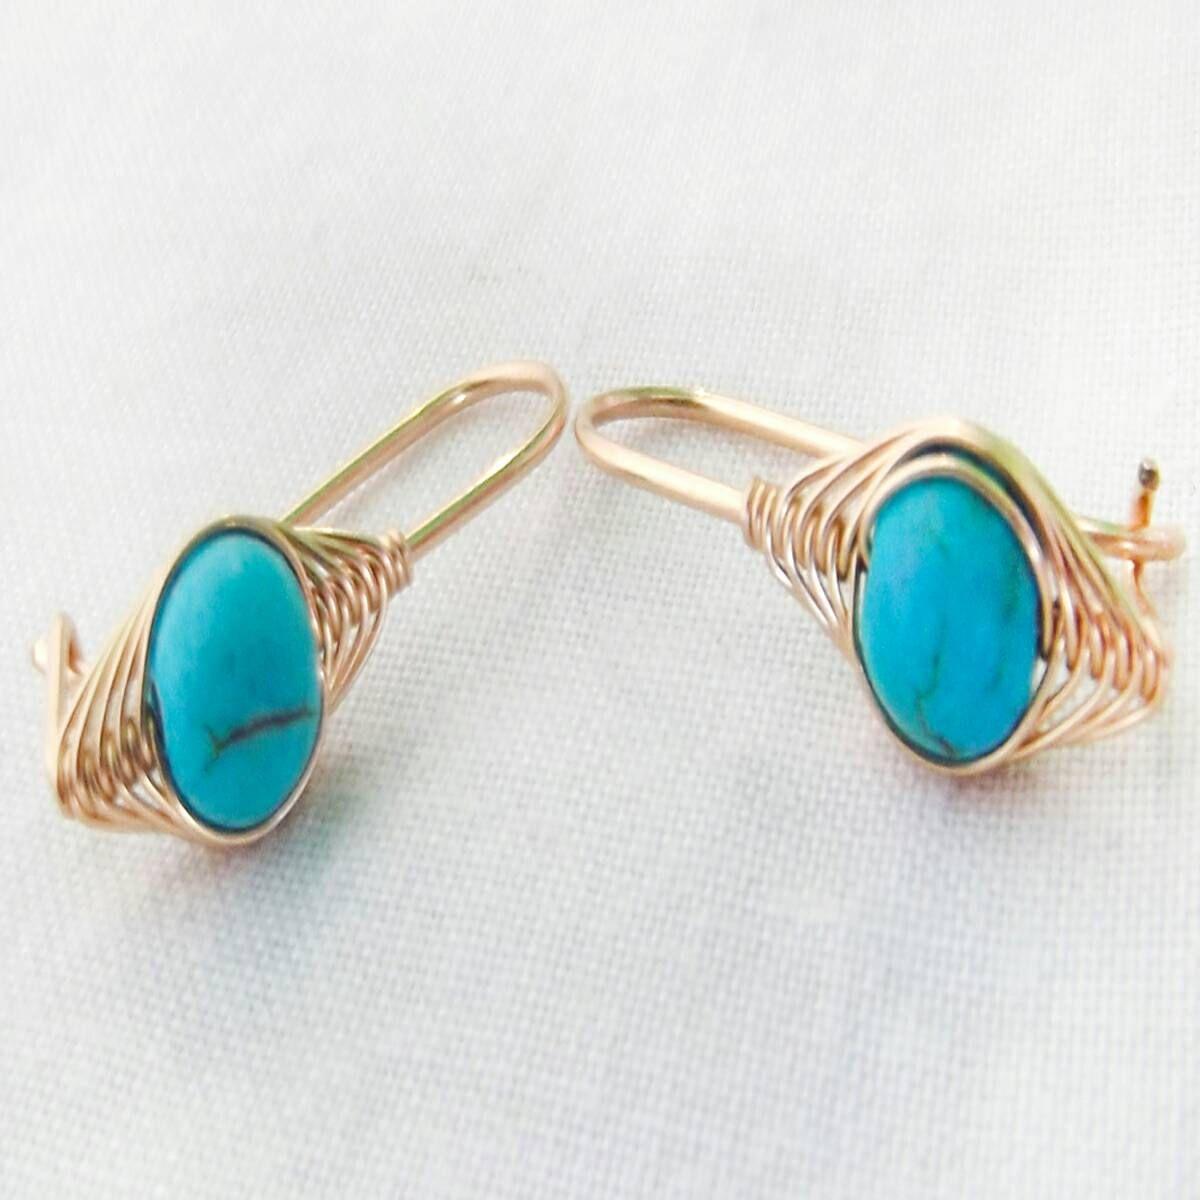 Turquoise earrings, turquoise gold earrings, gemstone ...